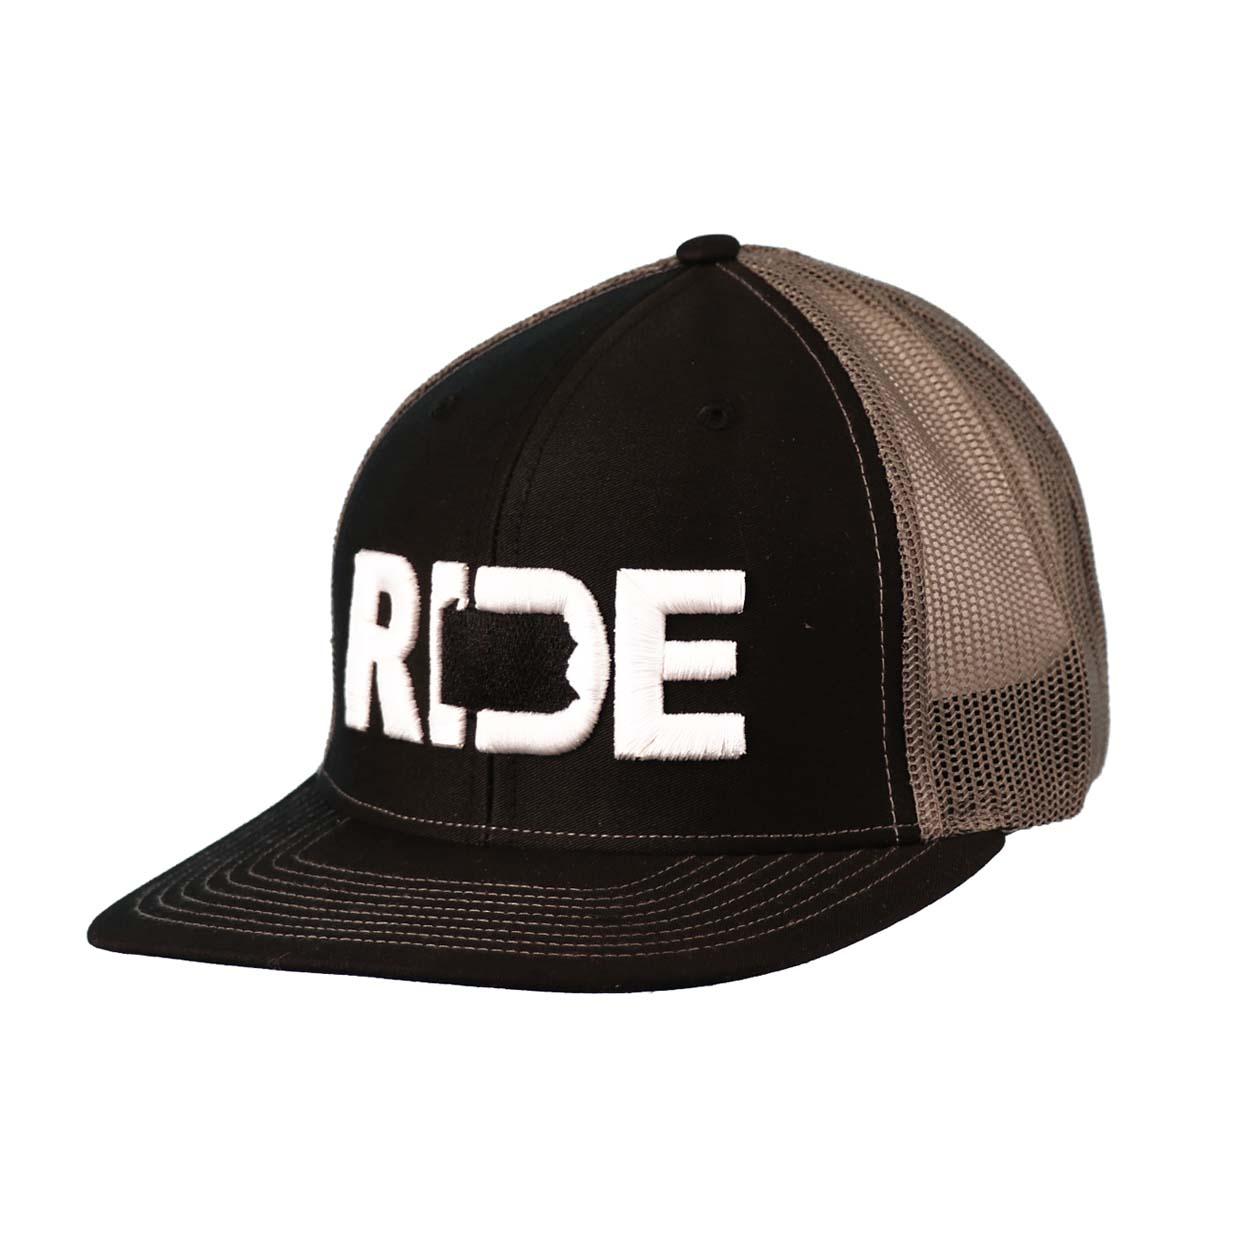 Ride Pennsylvania Classic Embroidered Snapback Trucker Hat Black/White